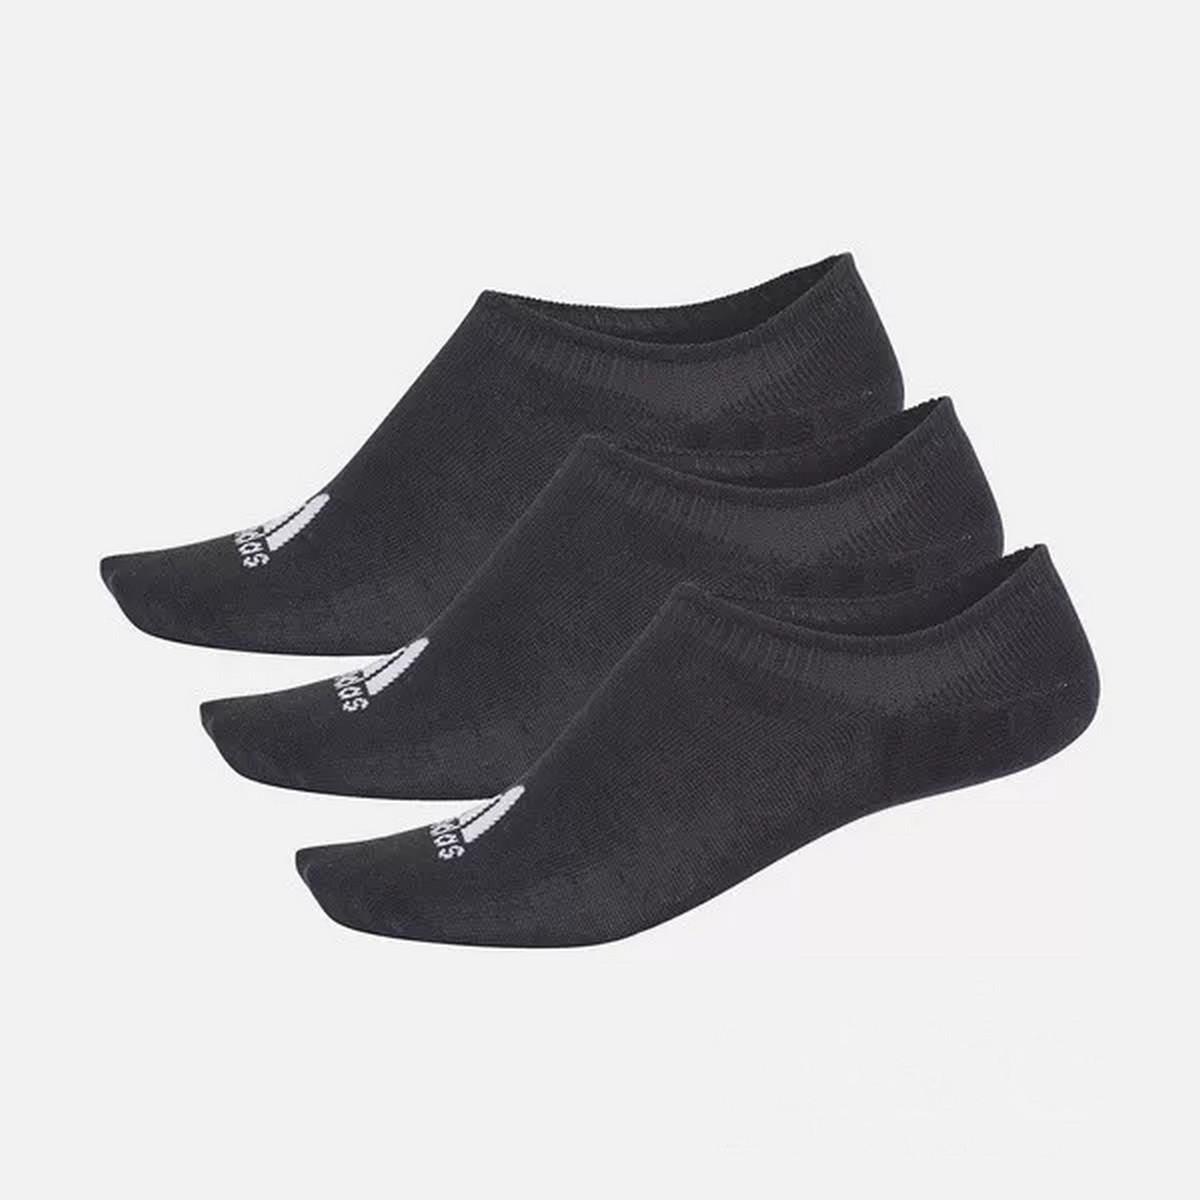 Носки Adidas Performance Invisible Socks 3PP CV7409